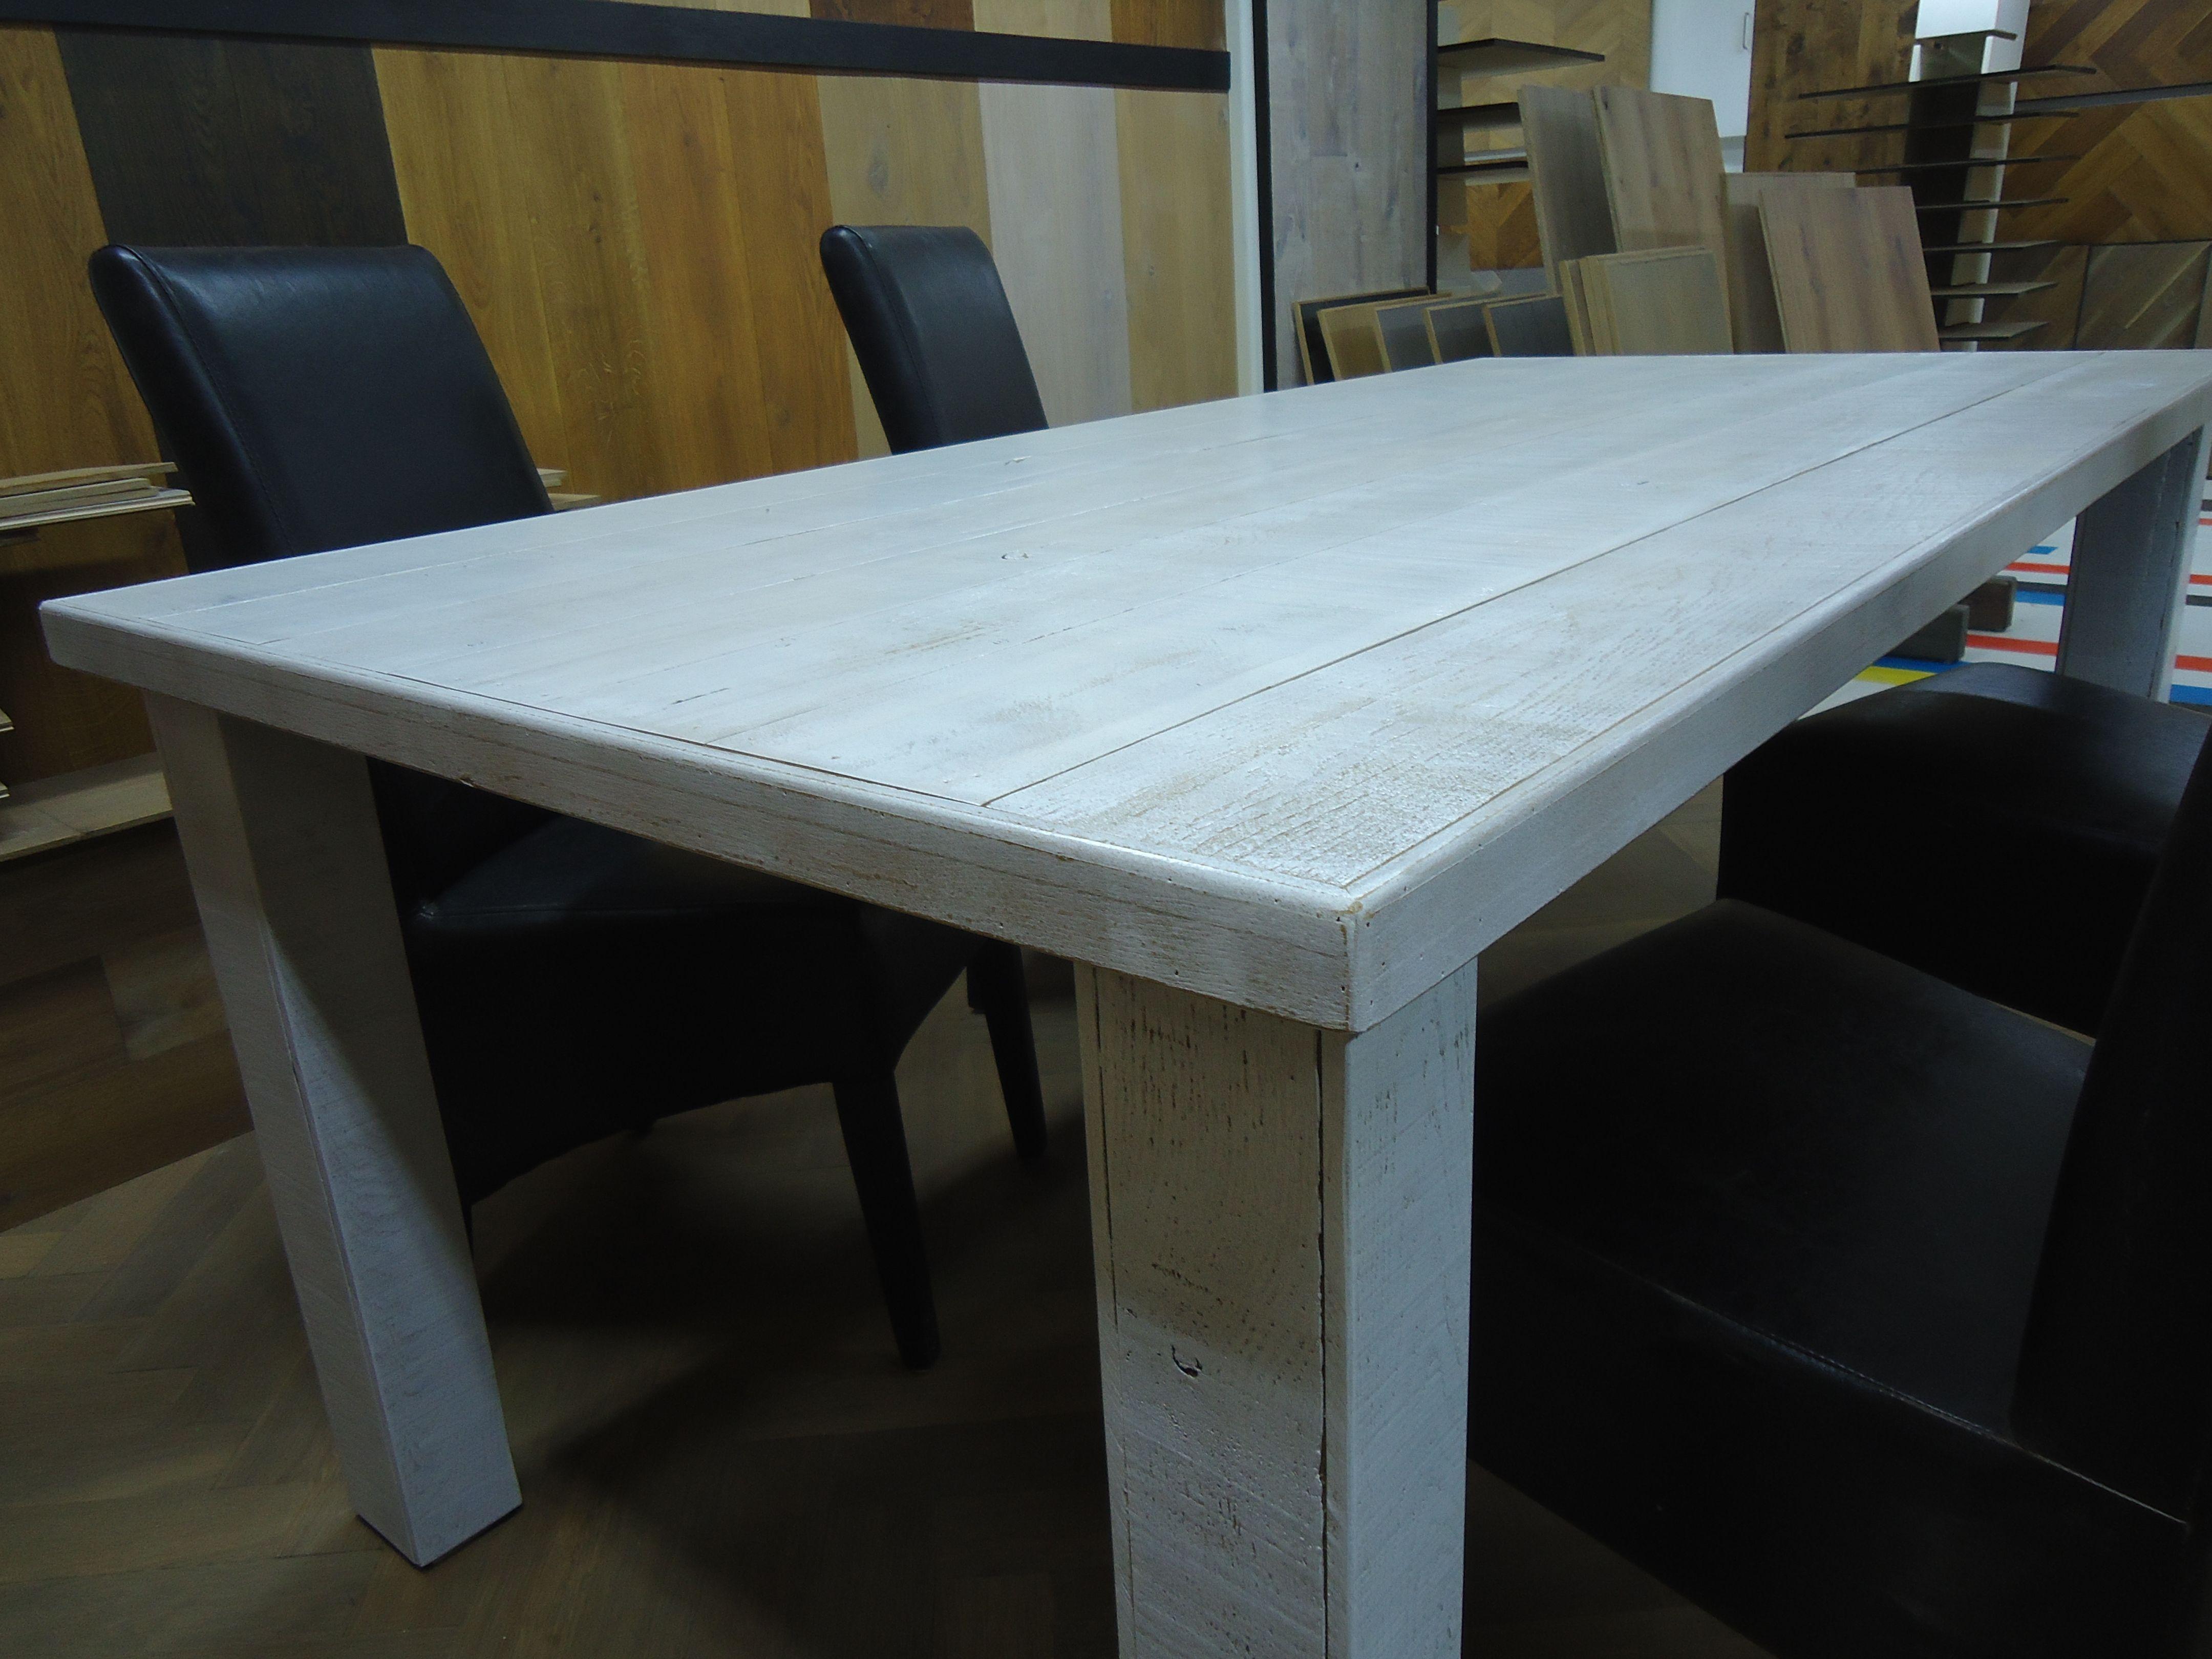 Wit Eiken Tafel : Robuuste witte eiken tafel zaagzijde zichtzijde. tafels zelf